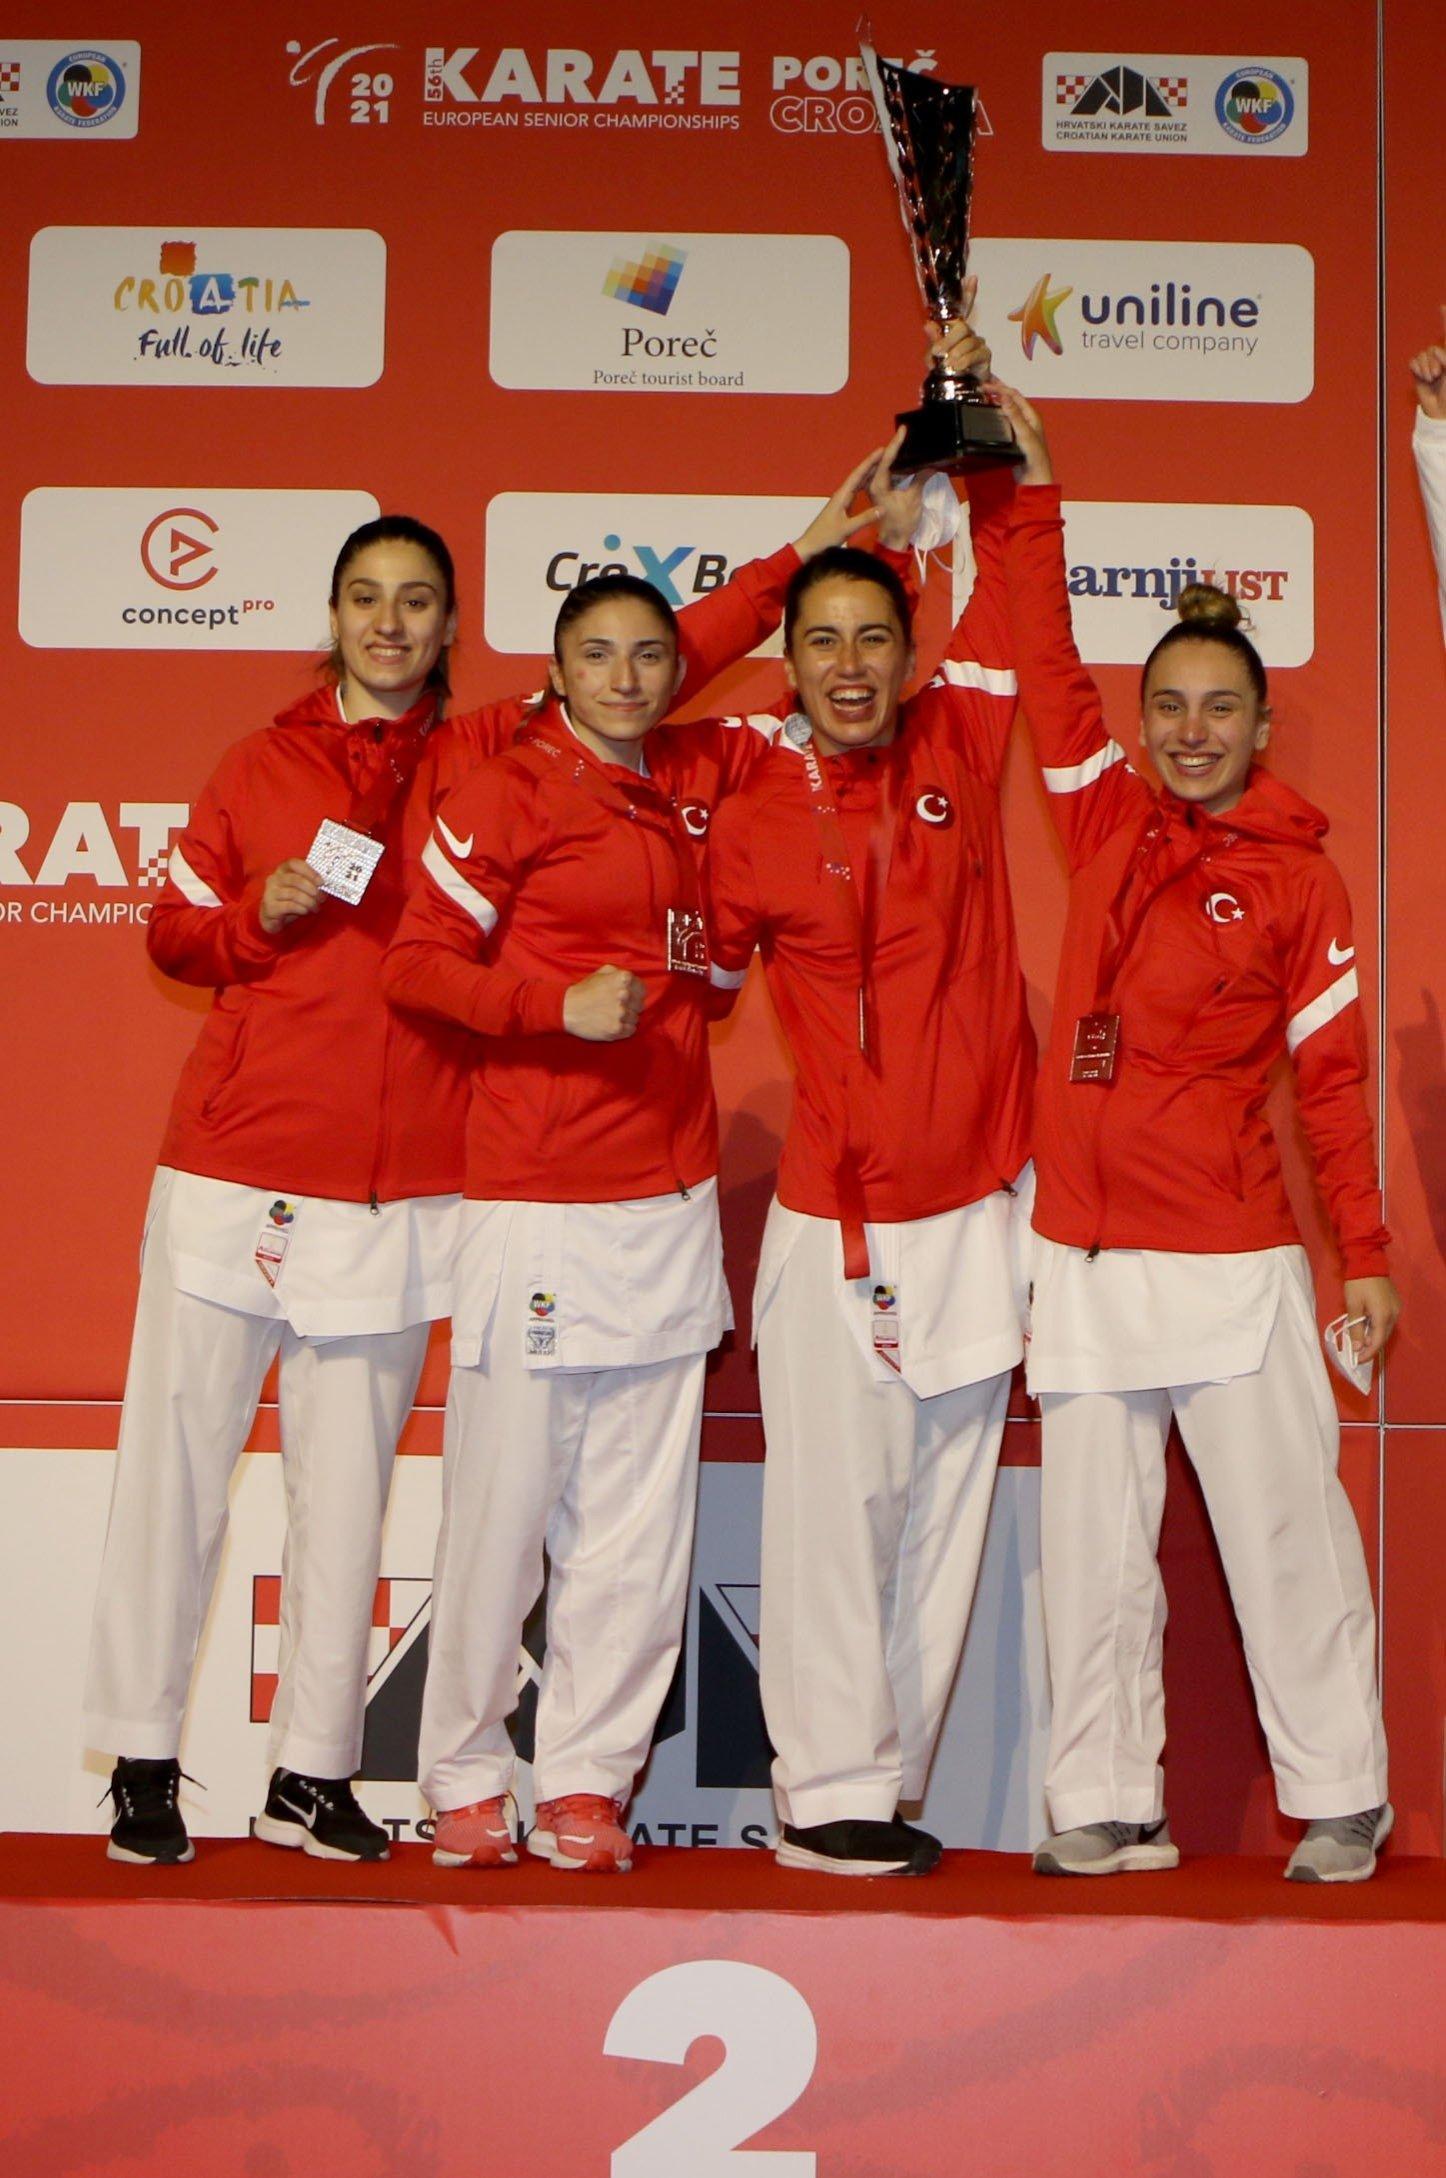 Turkish women's national Kumite team celebrates winning the silver medal in the European Senior Karate Championships, Porec, Croatia, May 22, 2021. (IHA Photo)